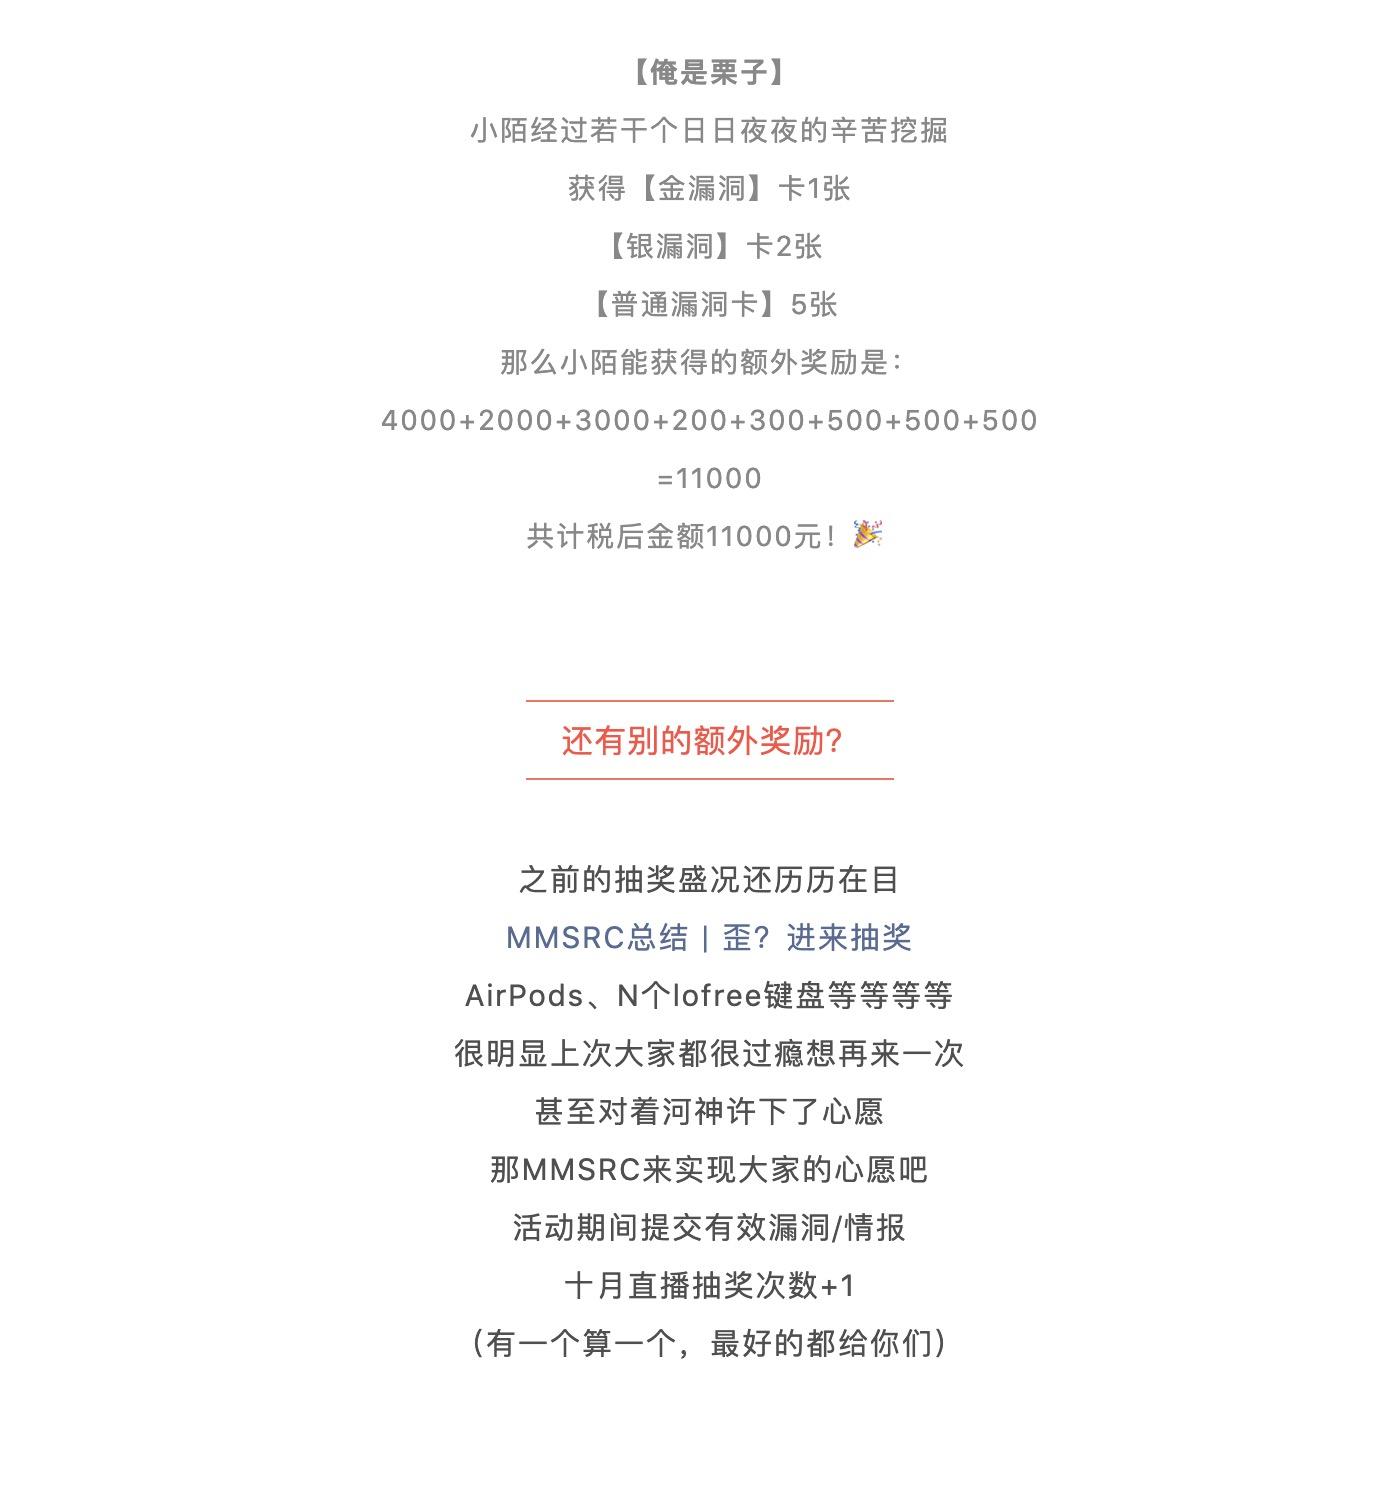 https://momo-mmsrc.oss-cn-hangzhou.aliyuncs.com/img-b16d912a-c432-33c4-a80e-aa68913dba5f.jpeg